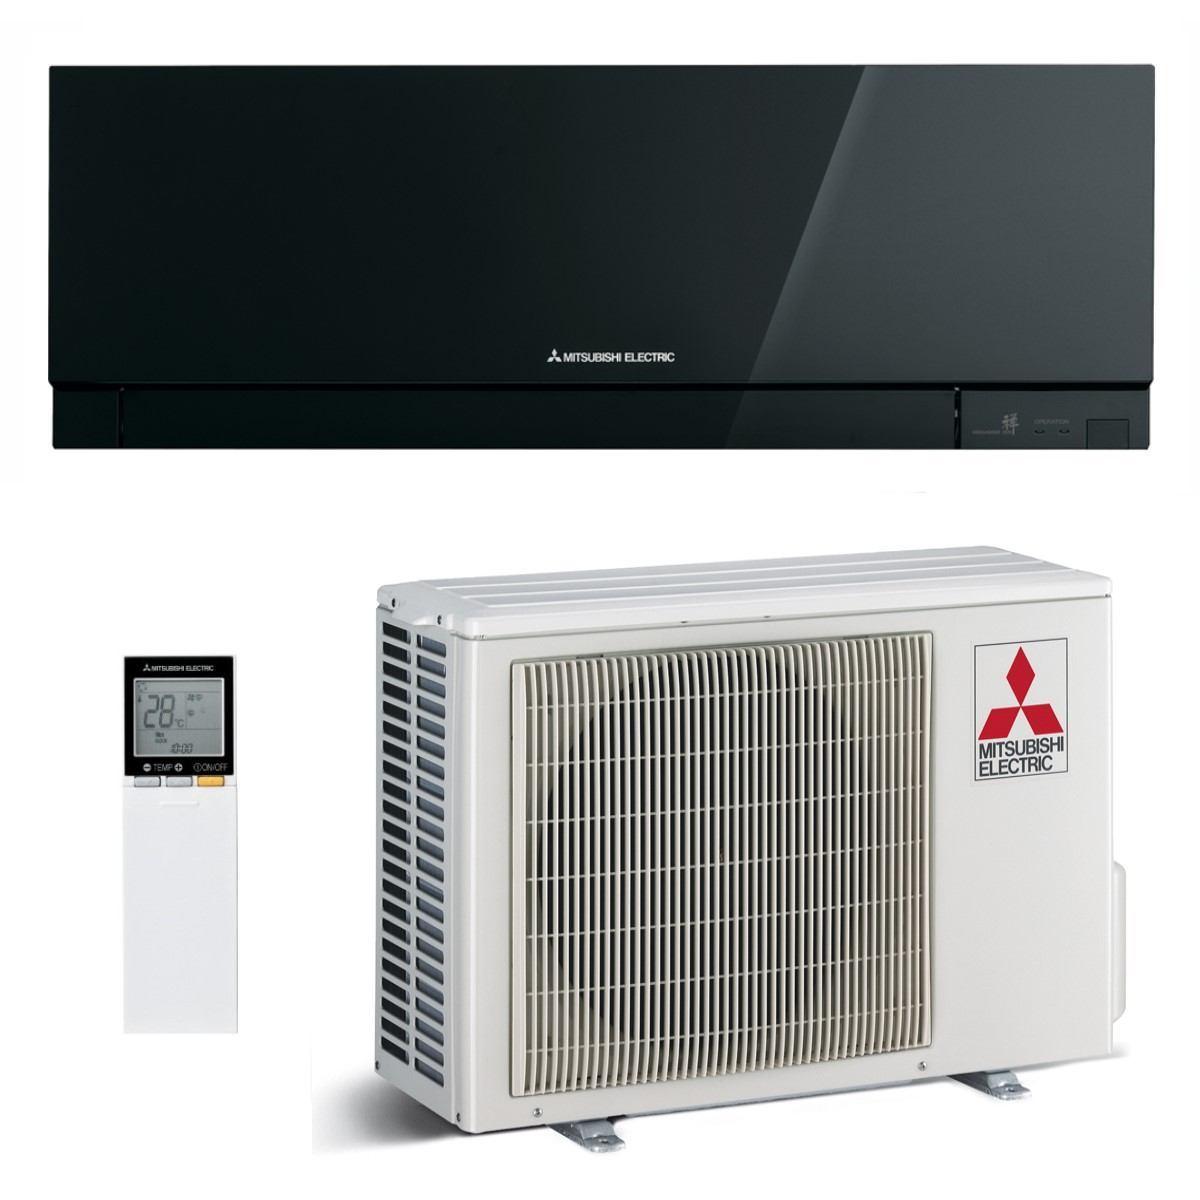 MITSUBISHI ELECTRIC KLIMA UREĐAJ MSZ-EF35VGB/MUZ-EF35VG R32